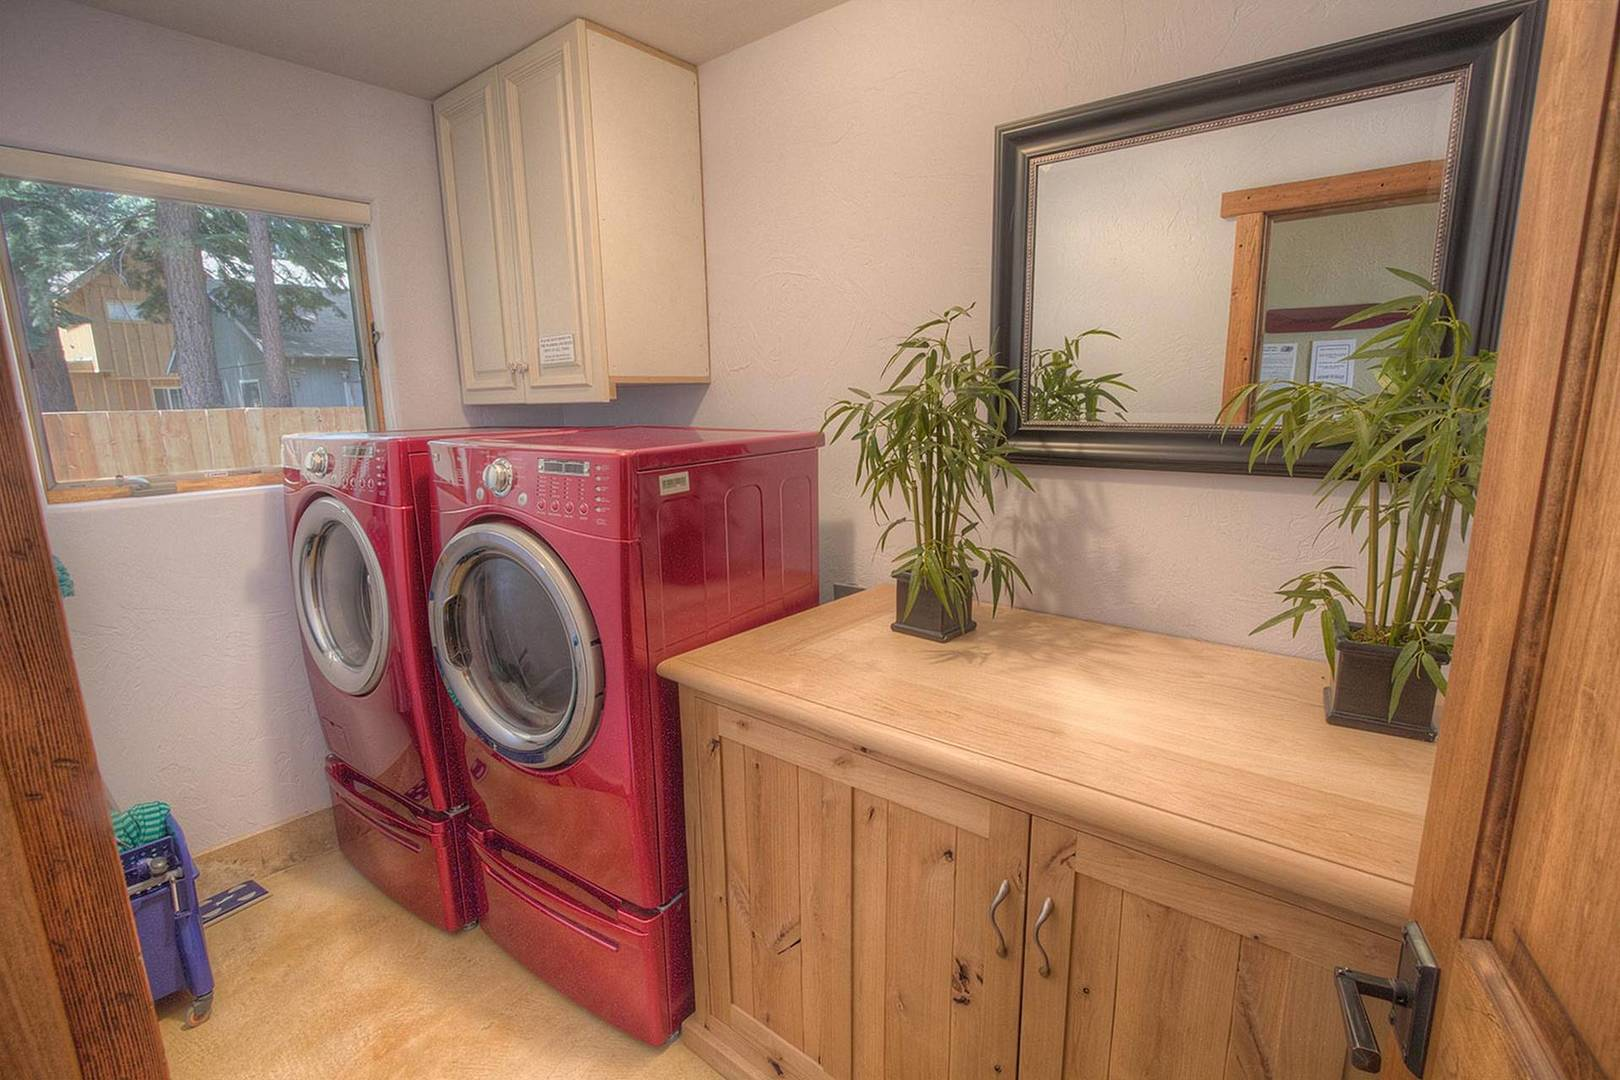 cyh1016 laundry room